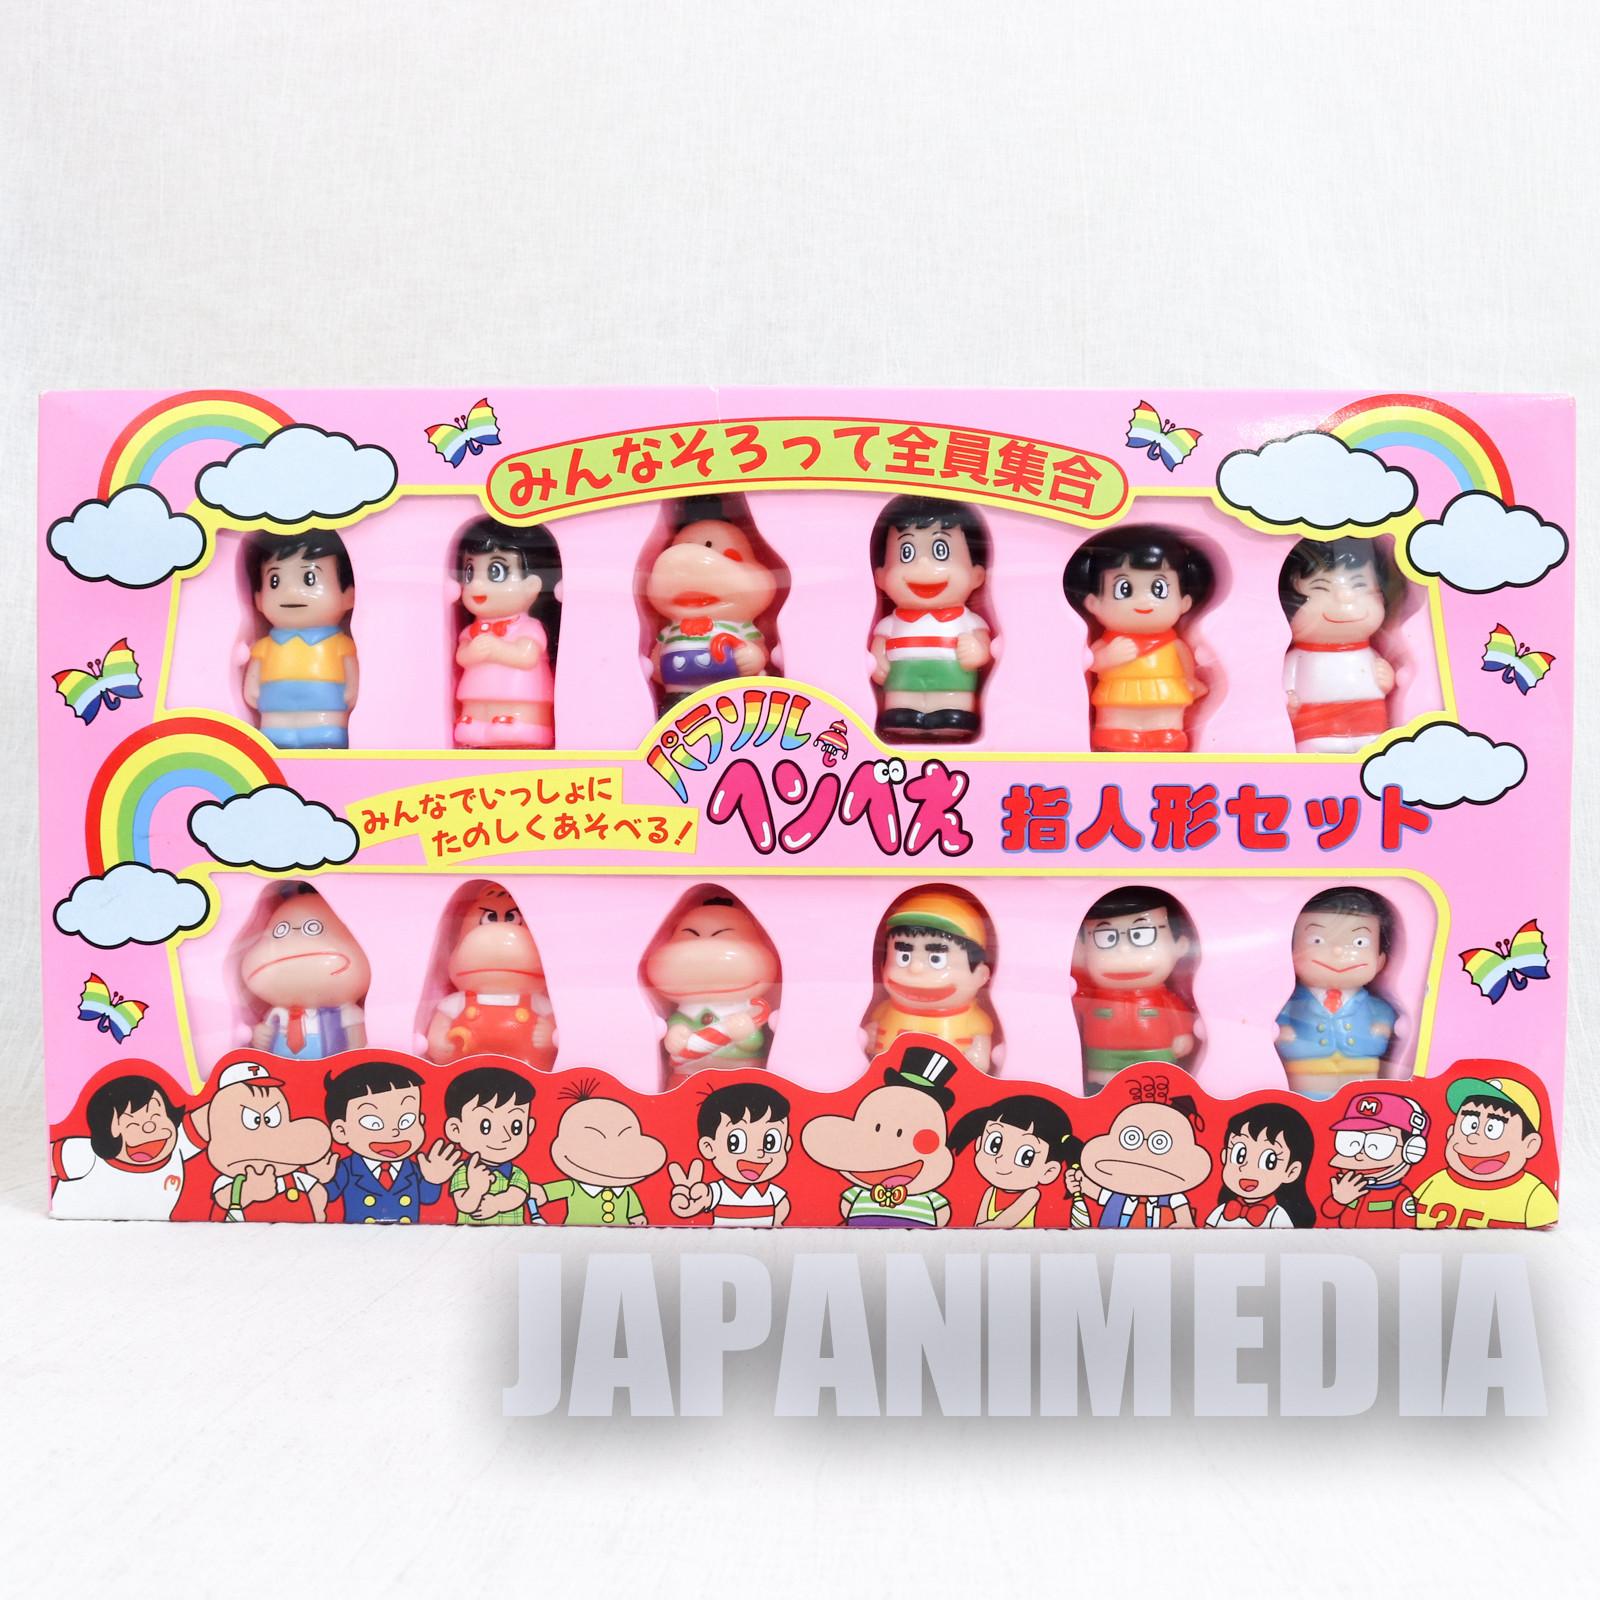 RARE! Parasol Henbee Soft Vinyl Finger Puppet Figure 12pc Set Fujiko A. Fujio